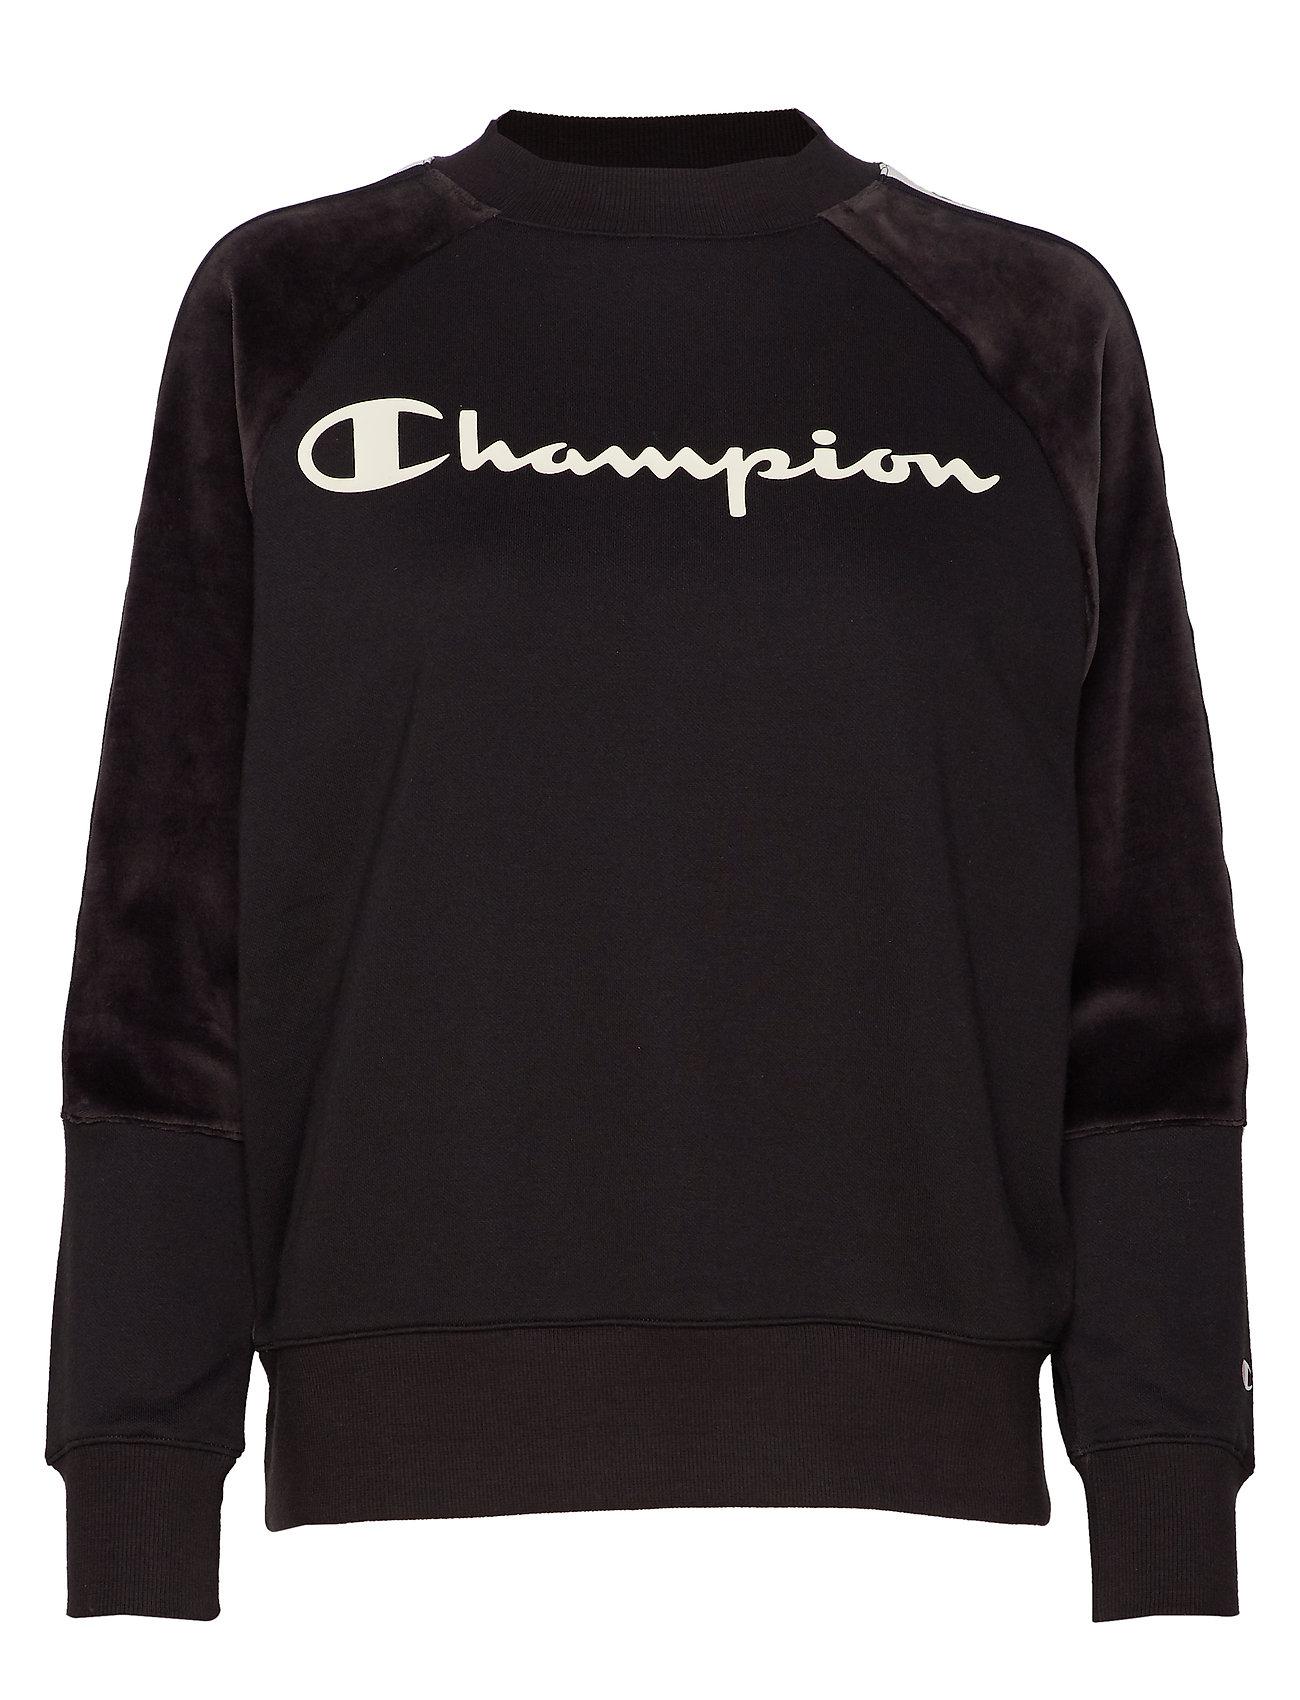 Champion Crewneck Sweatshirt - BLACK BEAUTY